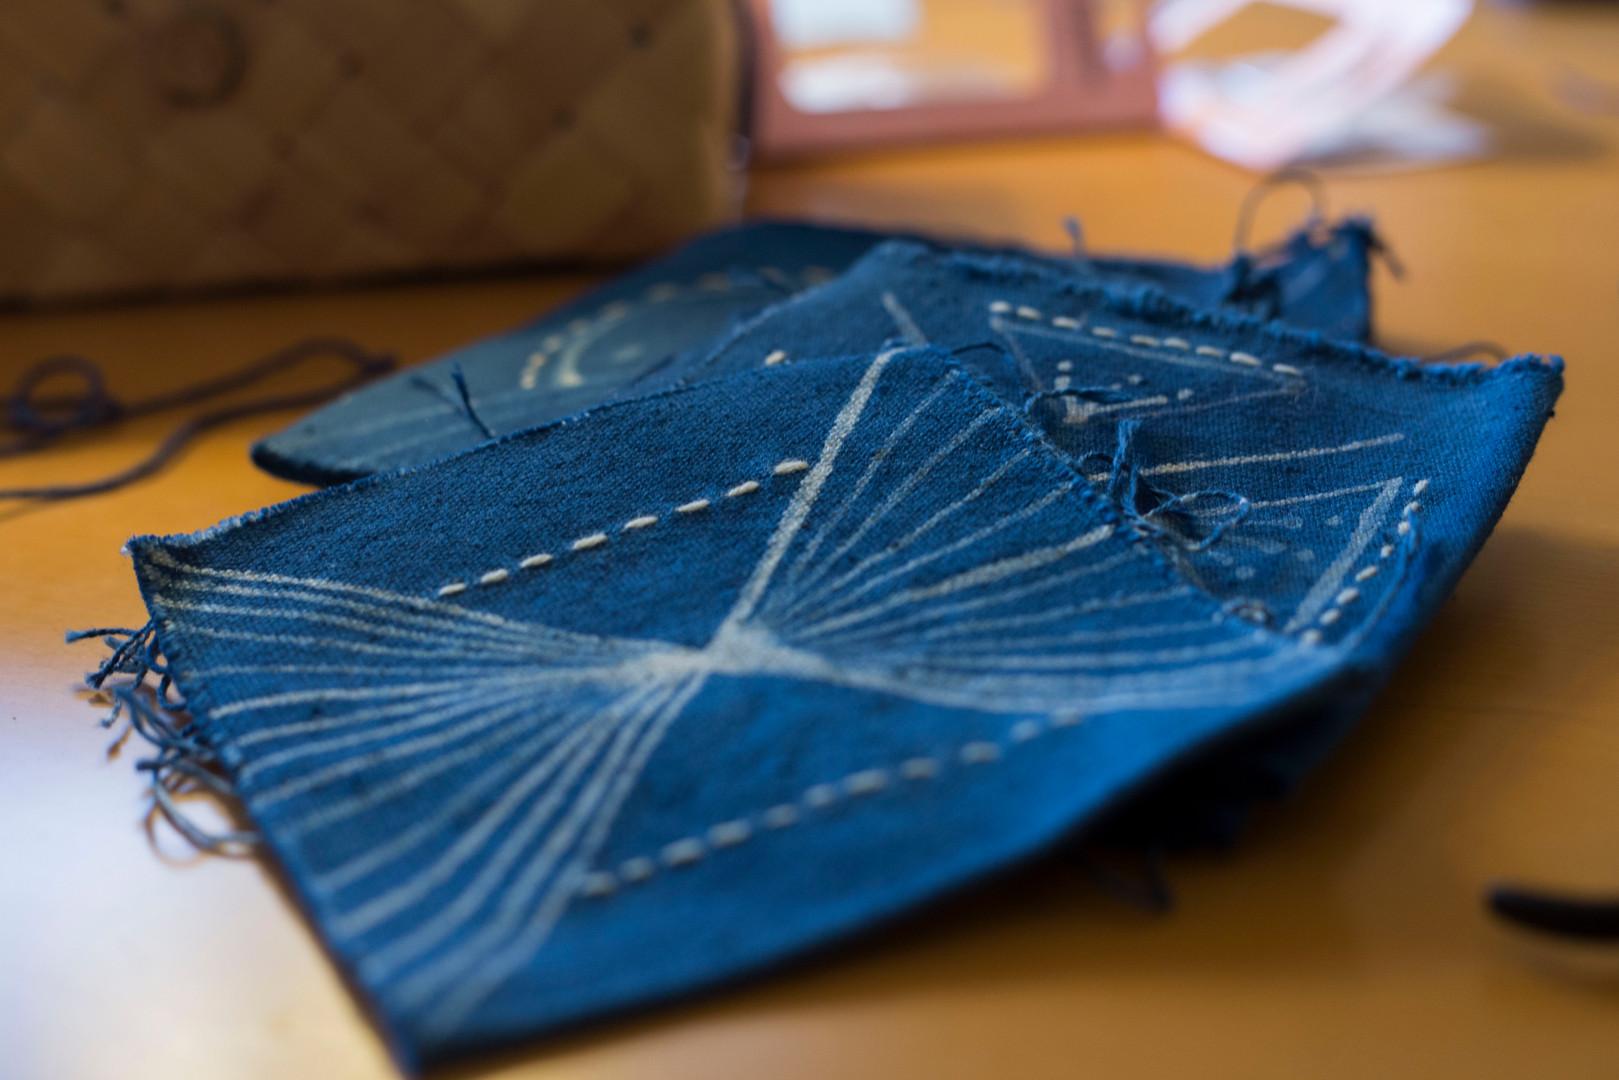 Adding detailing stitch